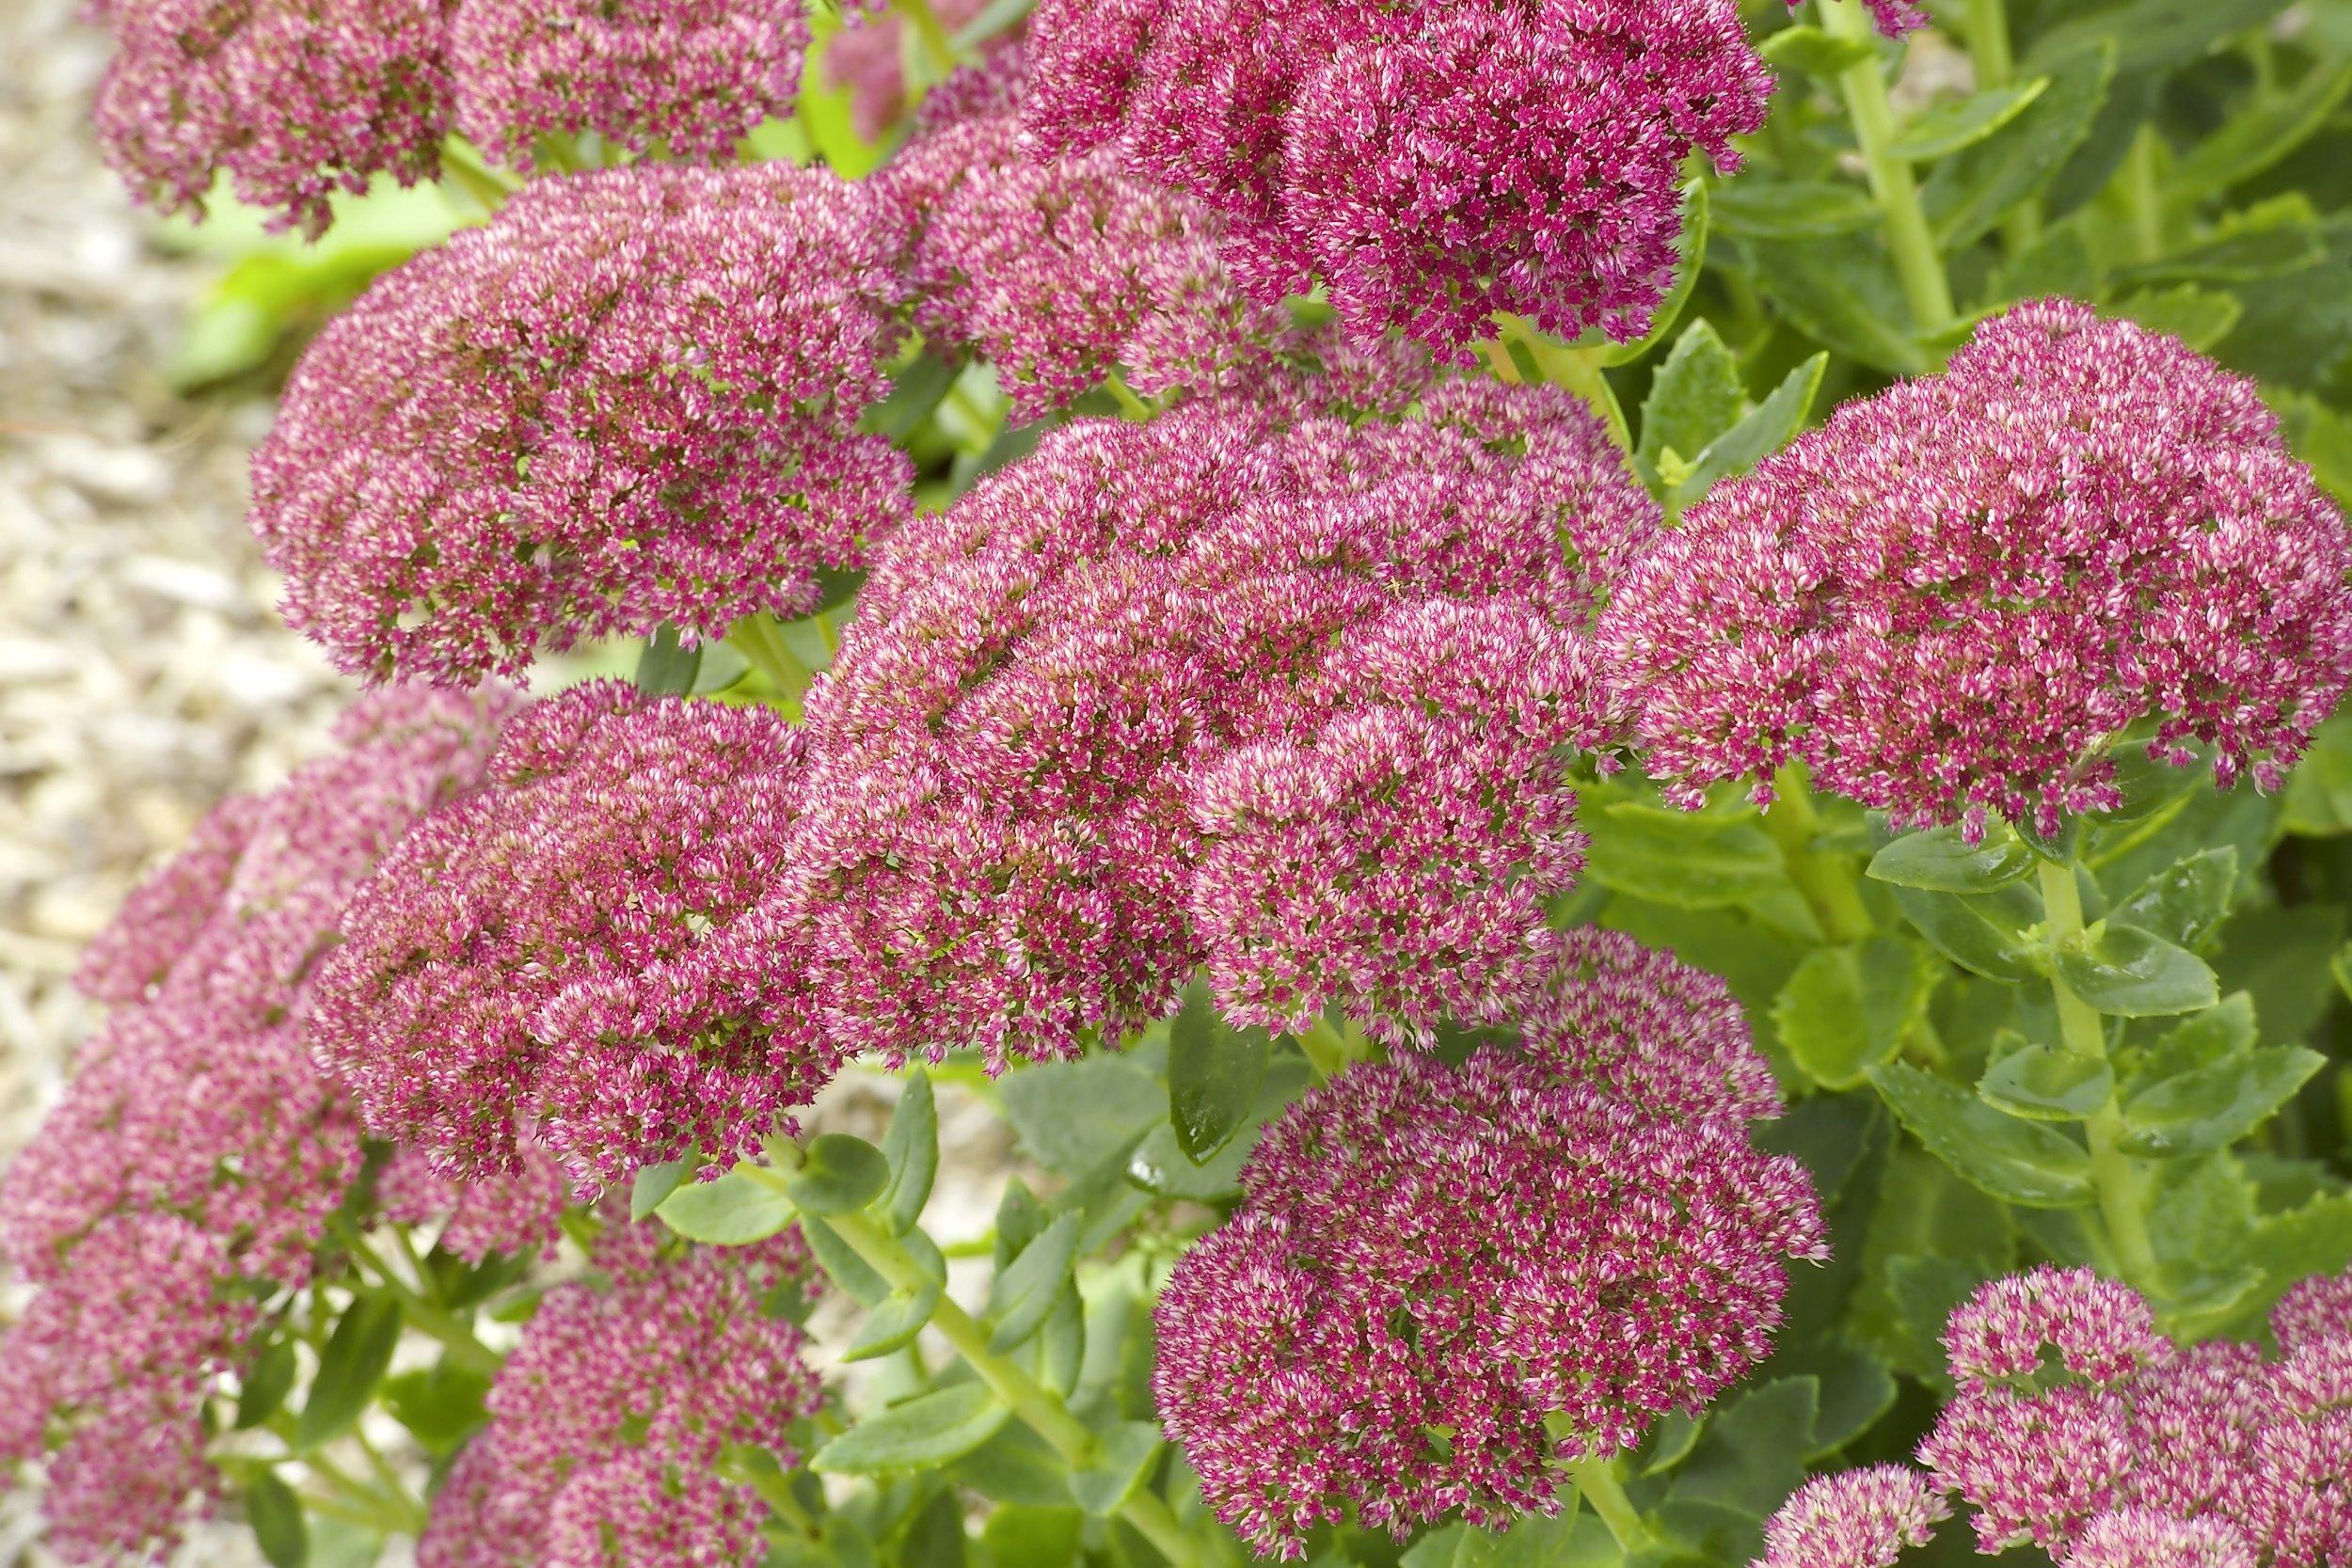 Hylotelephium 'Herbstfreude' (sedum 'Autumn Joy')